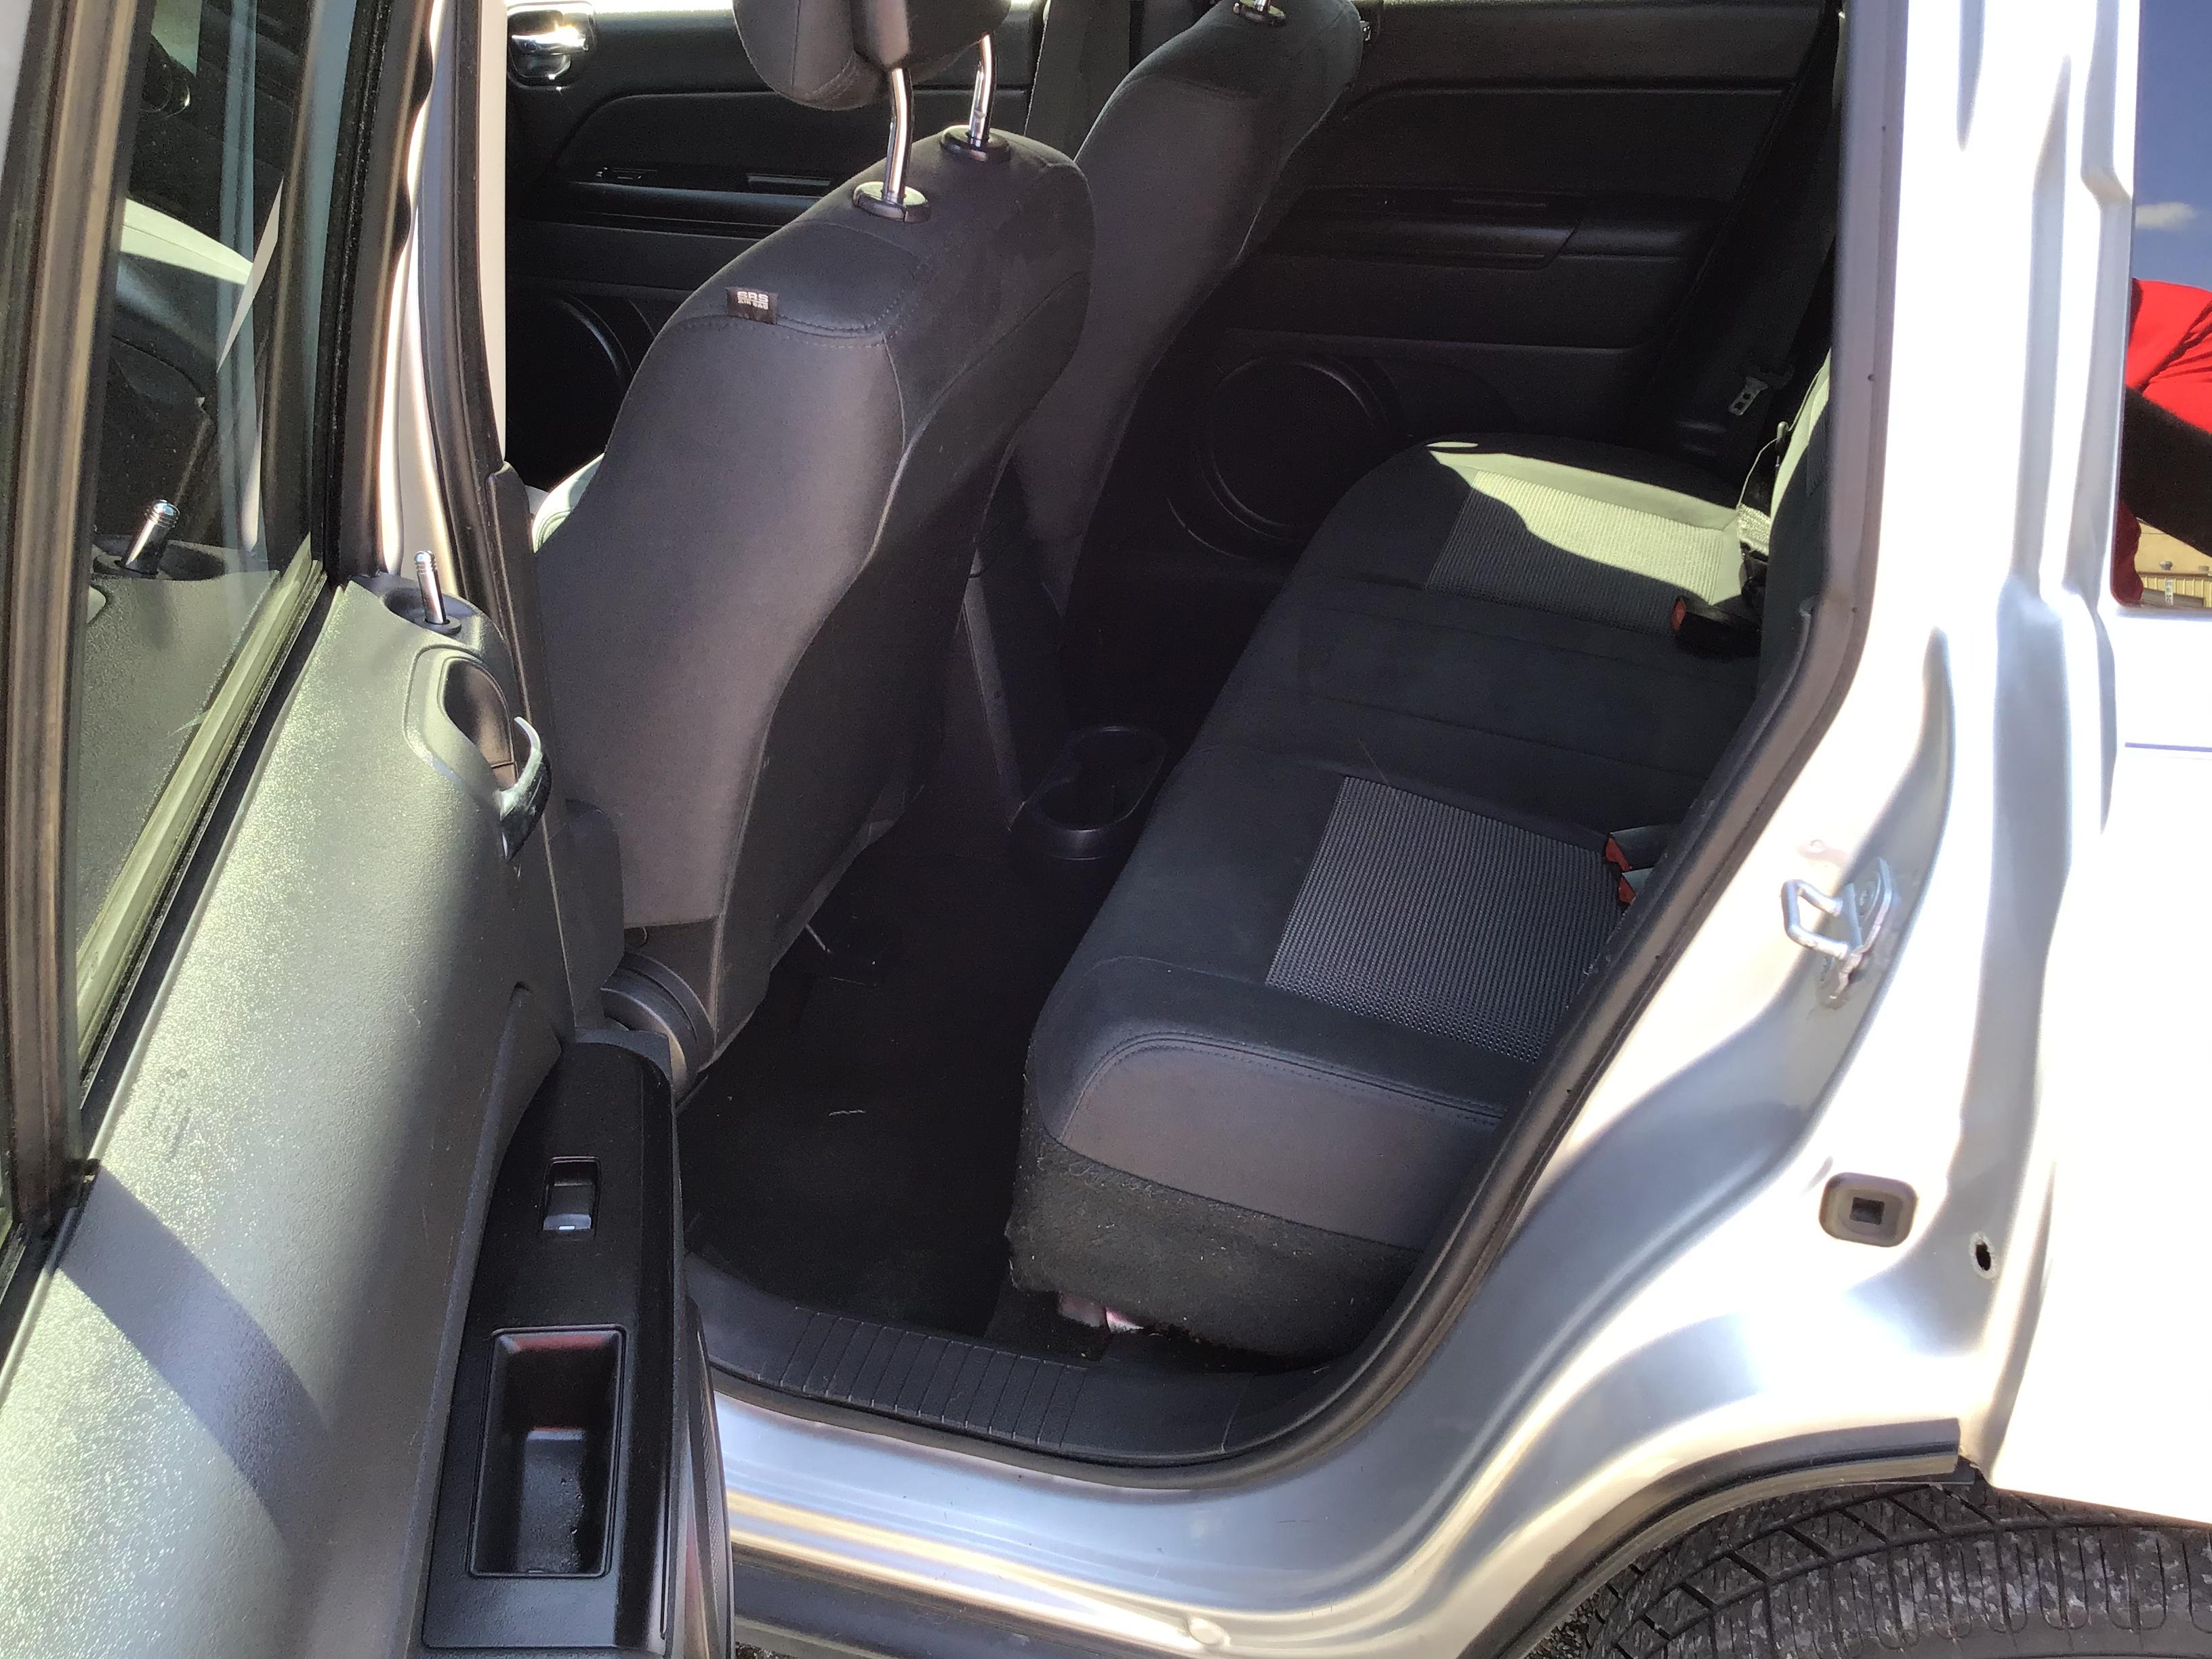 used vehicle - SUV JEEP COMPASS 2012